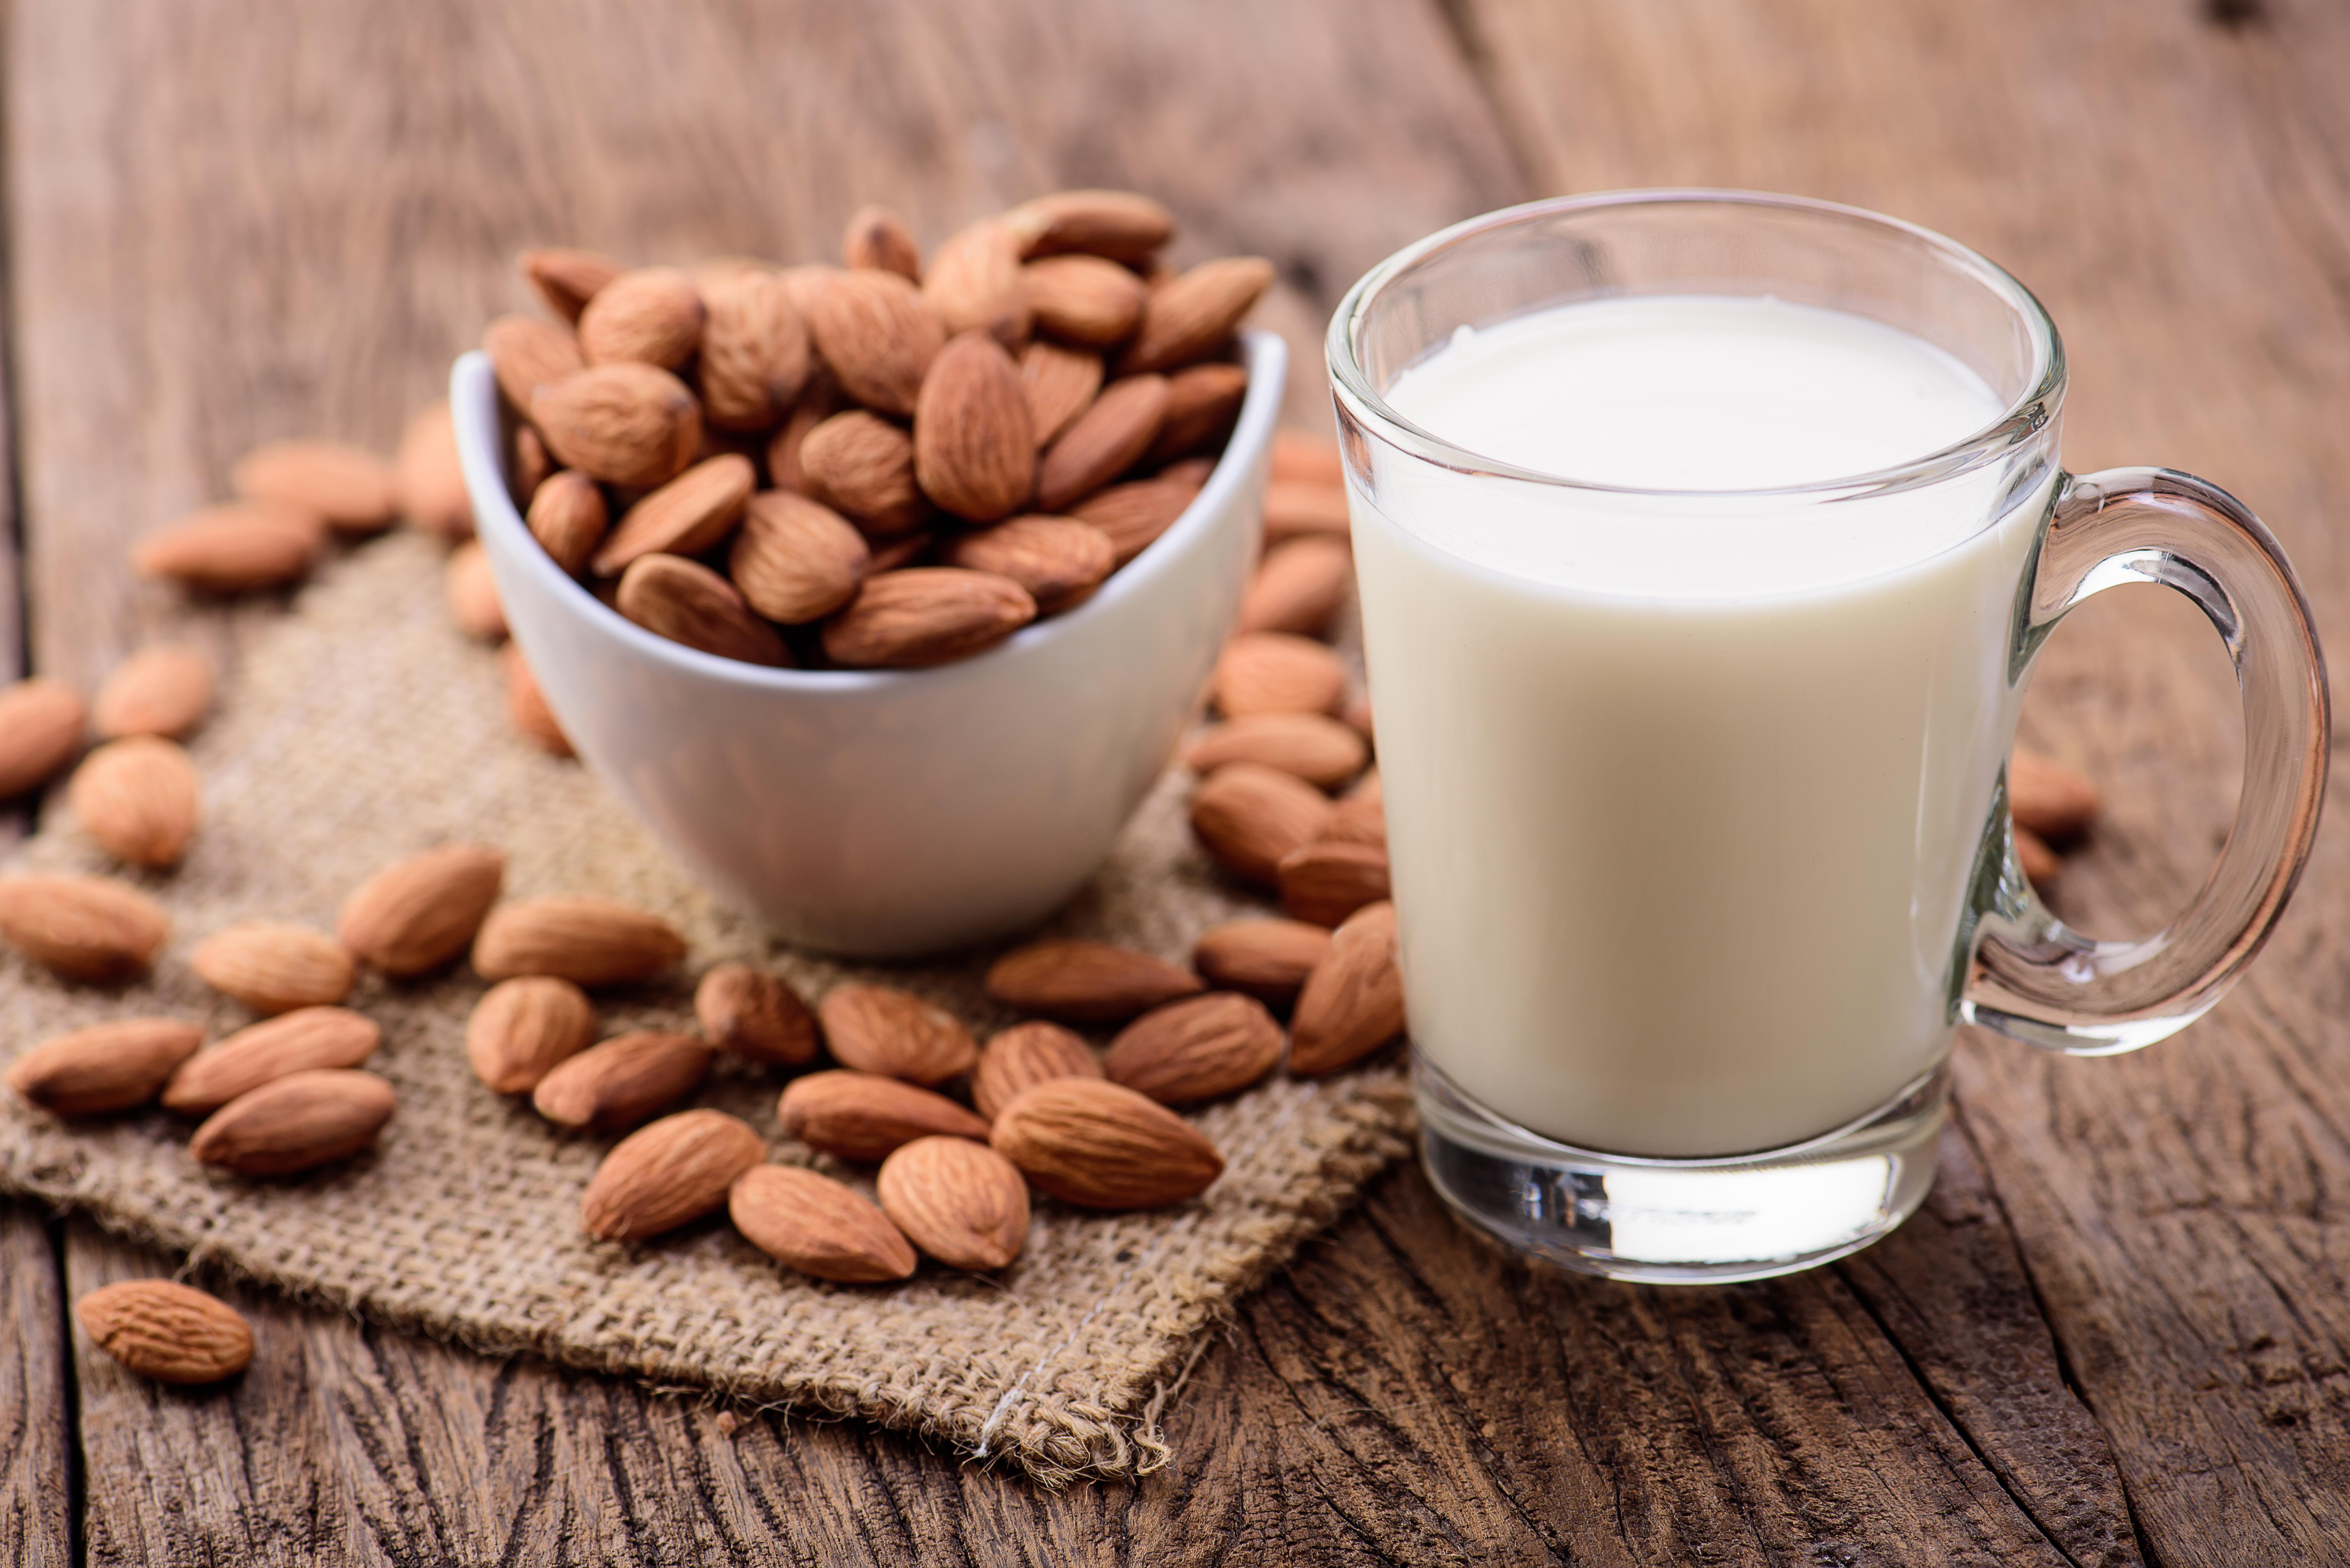 Bulk soy and nut milks